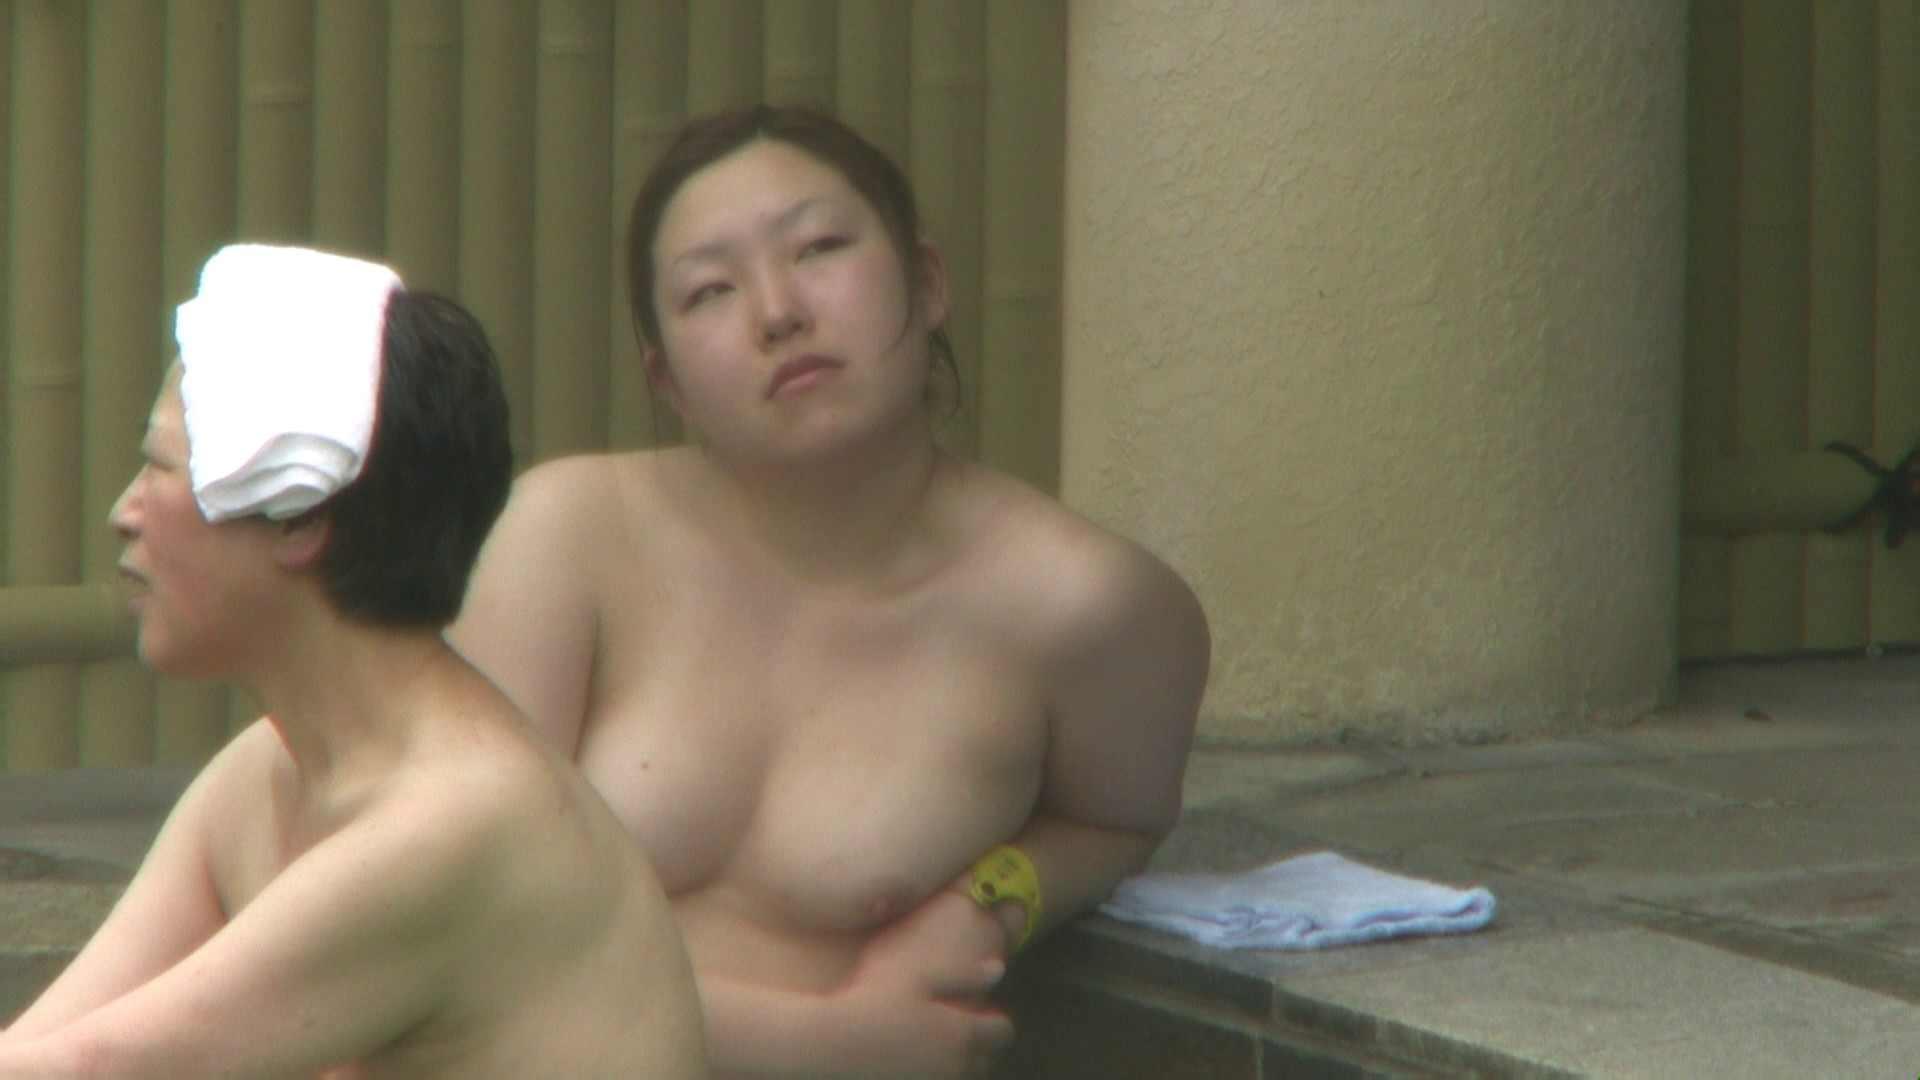 Aquaな露天風呂Vol.72【VIP限定】 露天風呂編 | 盗撮シリーズ  98PIX 39